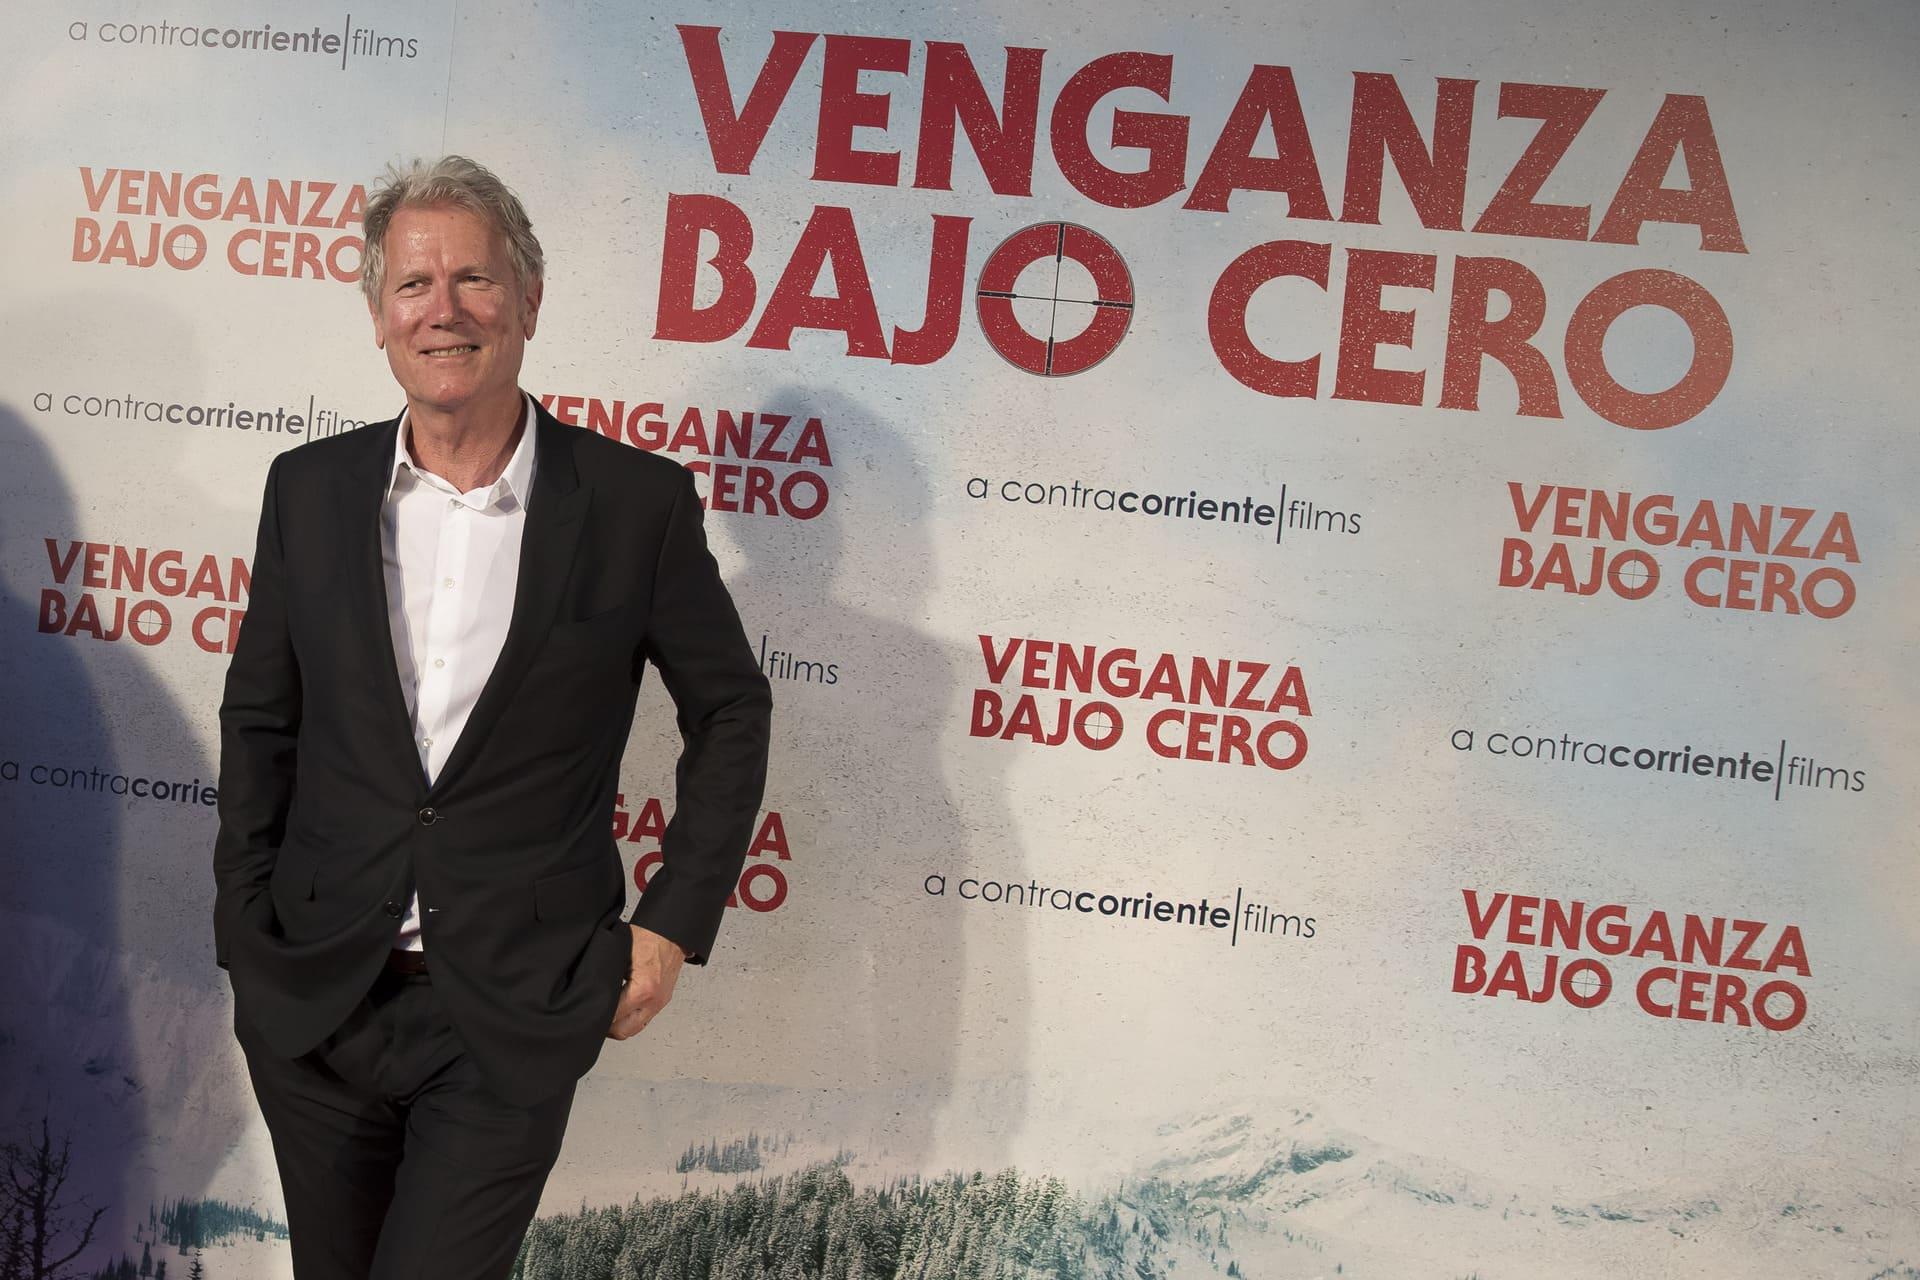 Entrevista a Hans Petter Moland Director Venganza Bajo Cero